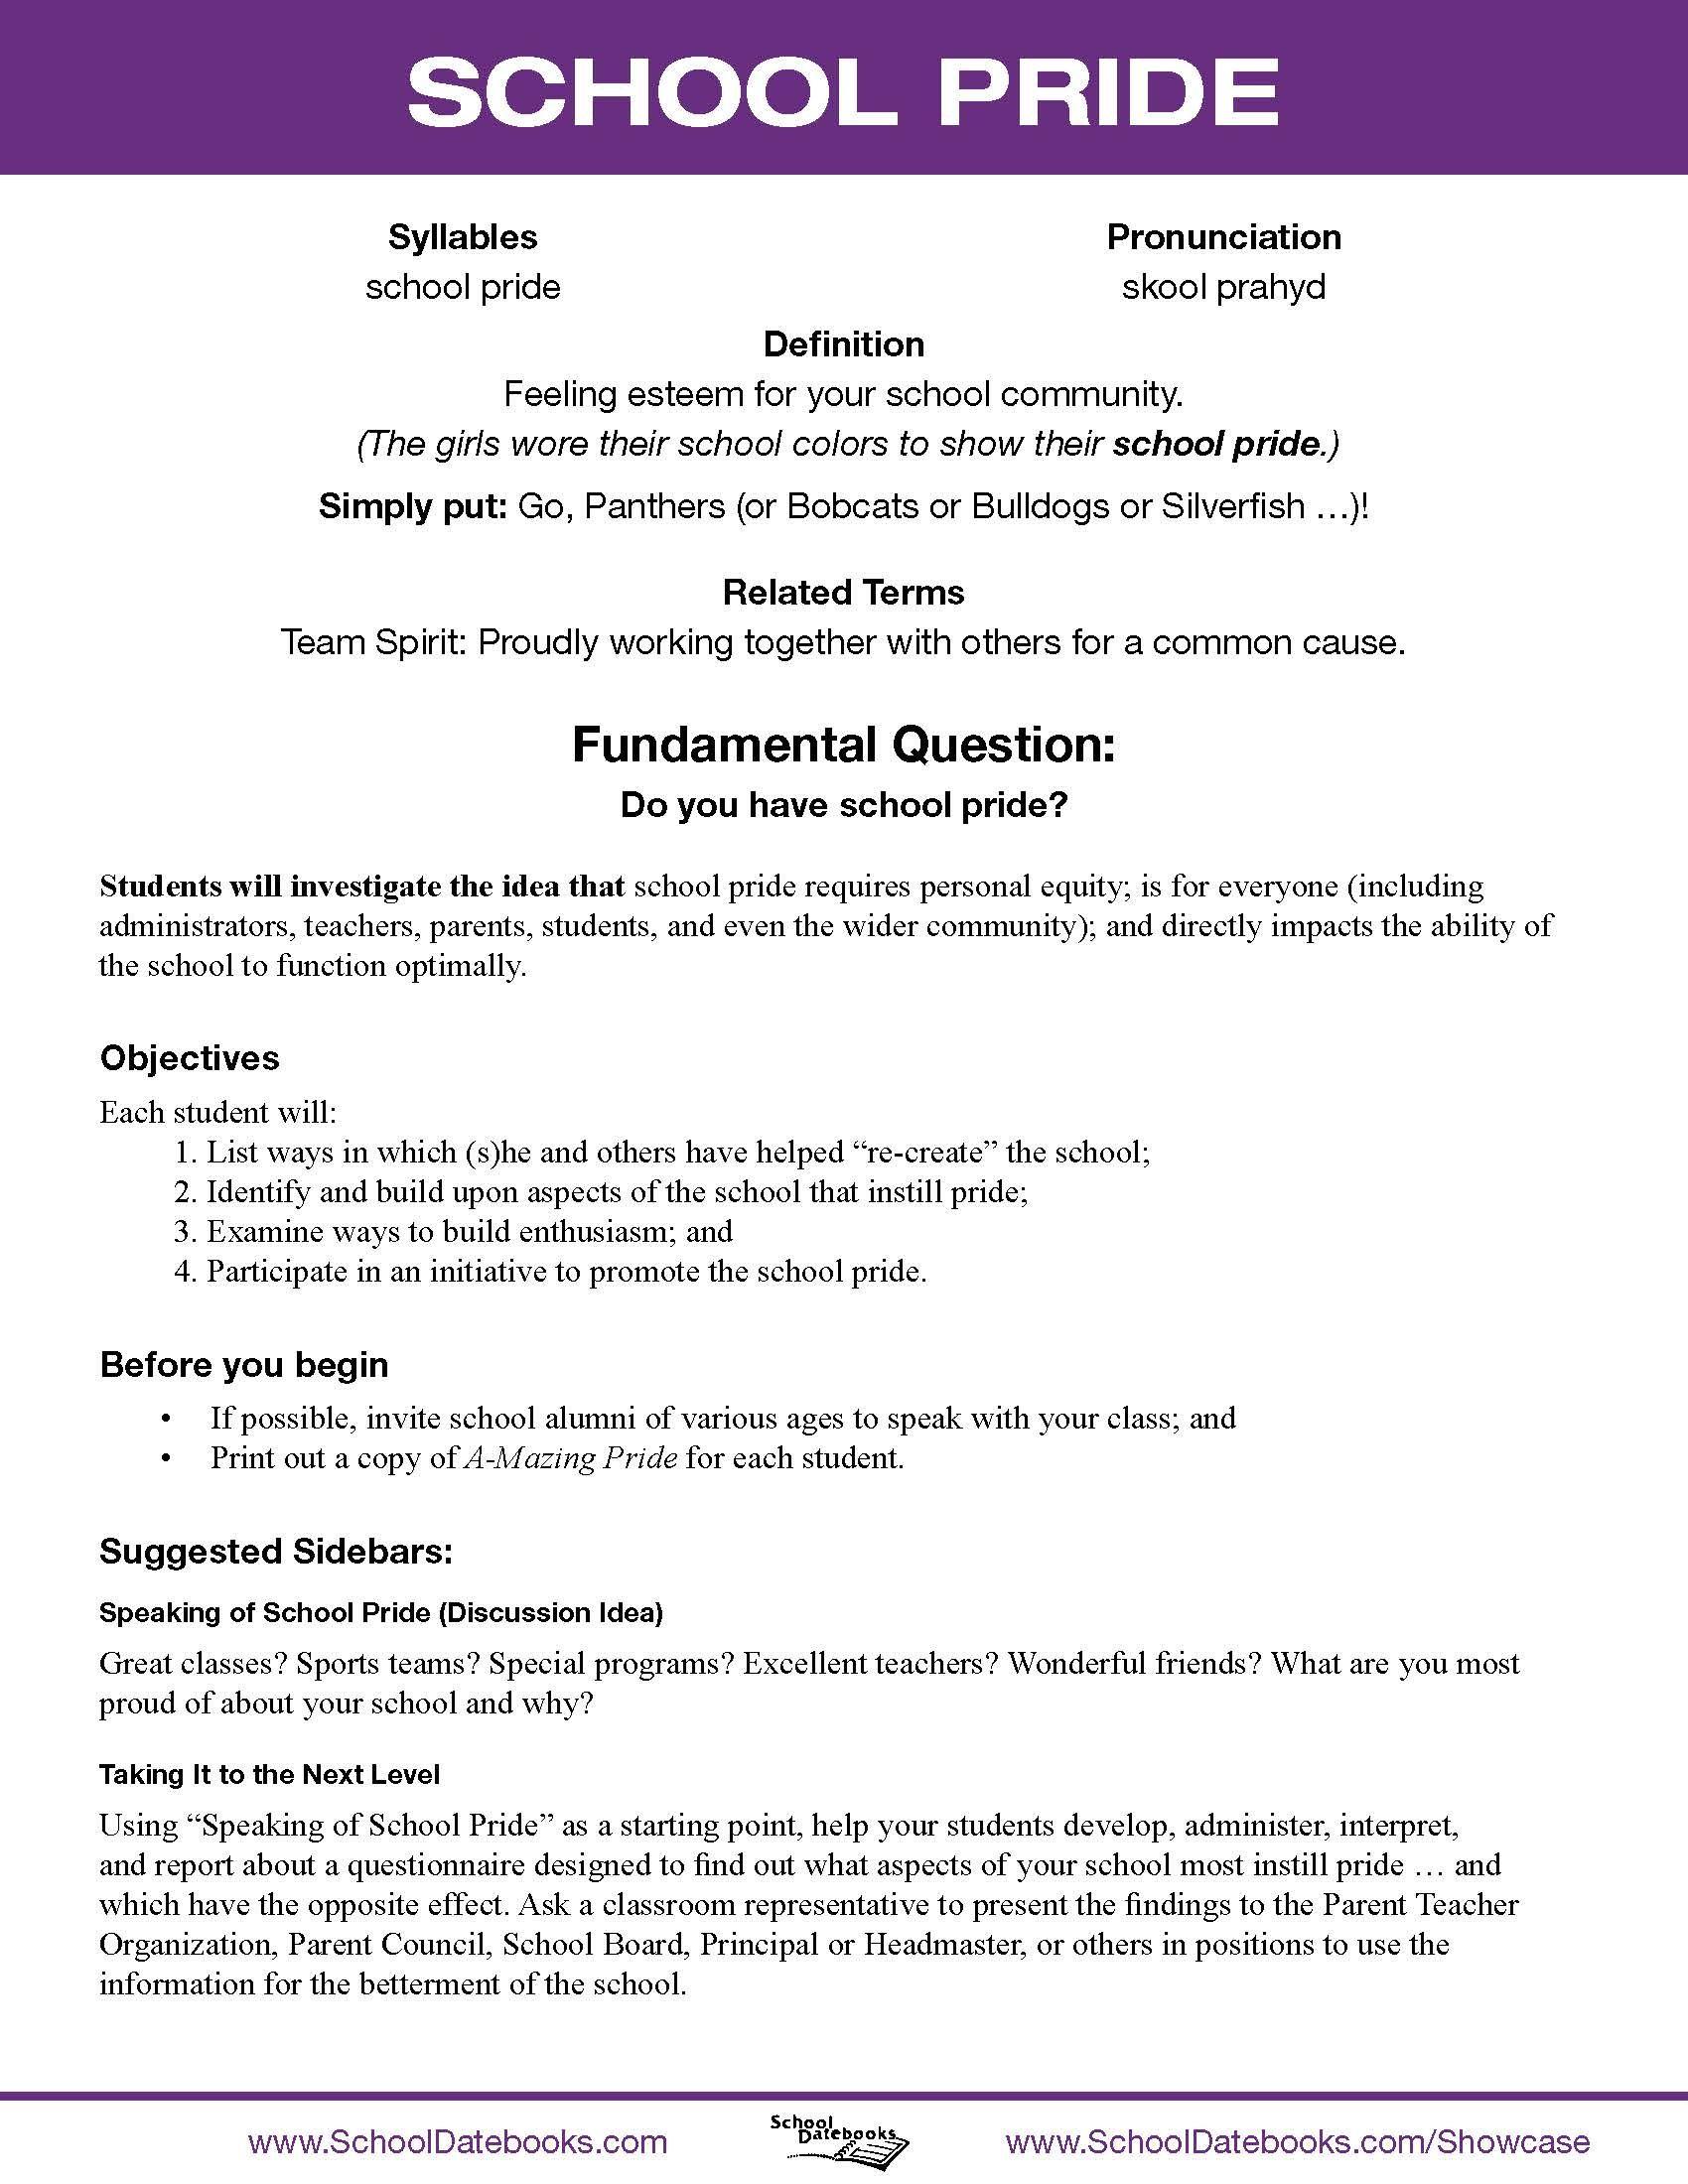 medium resolution of School Pride - Character Lesson Plan. Free